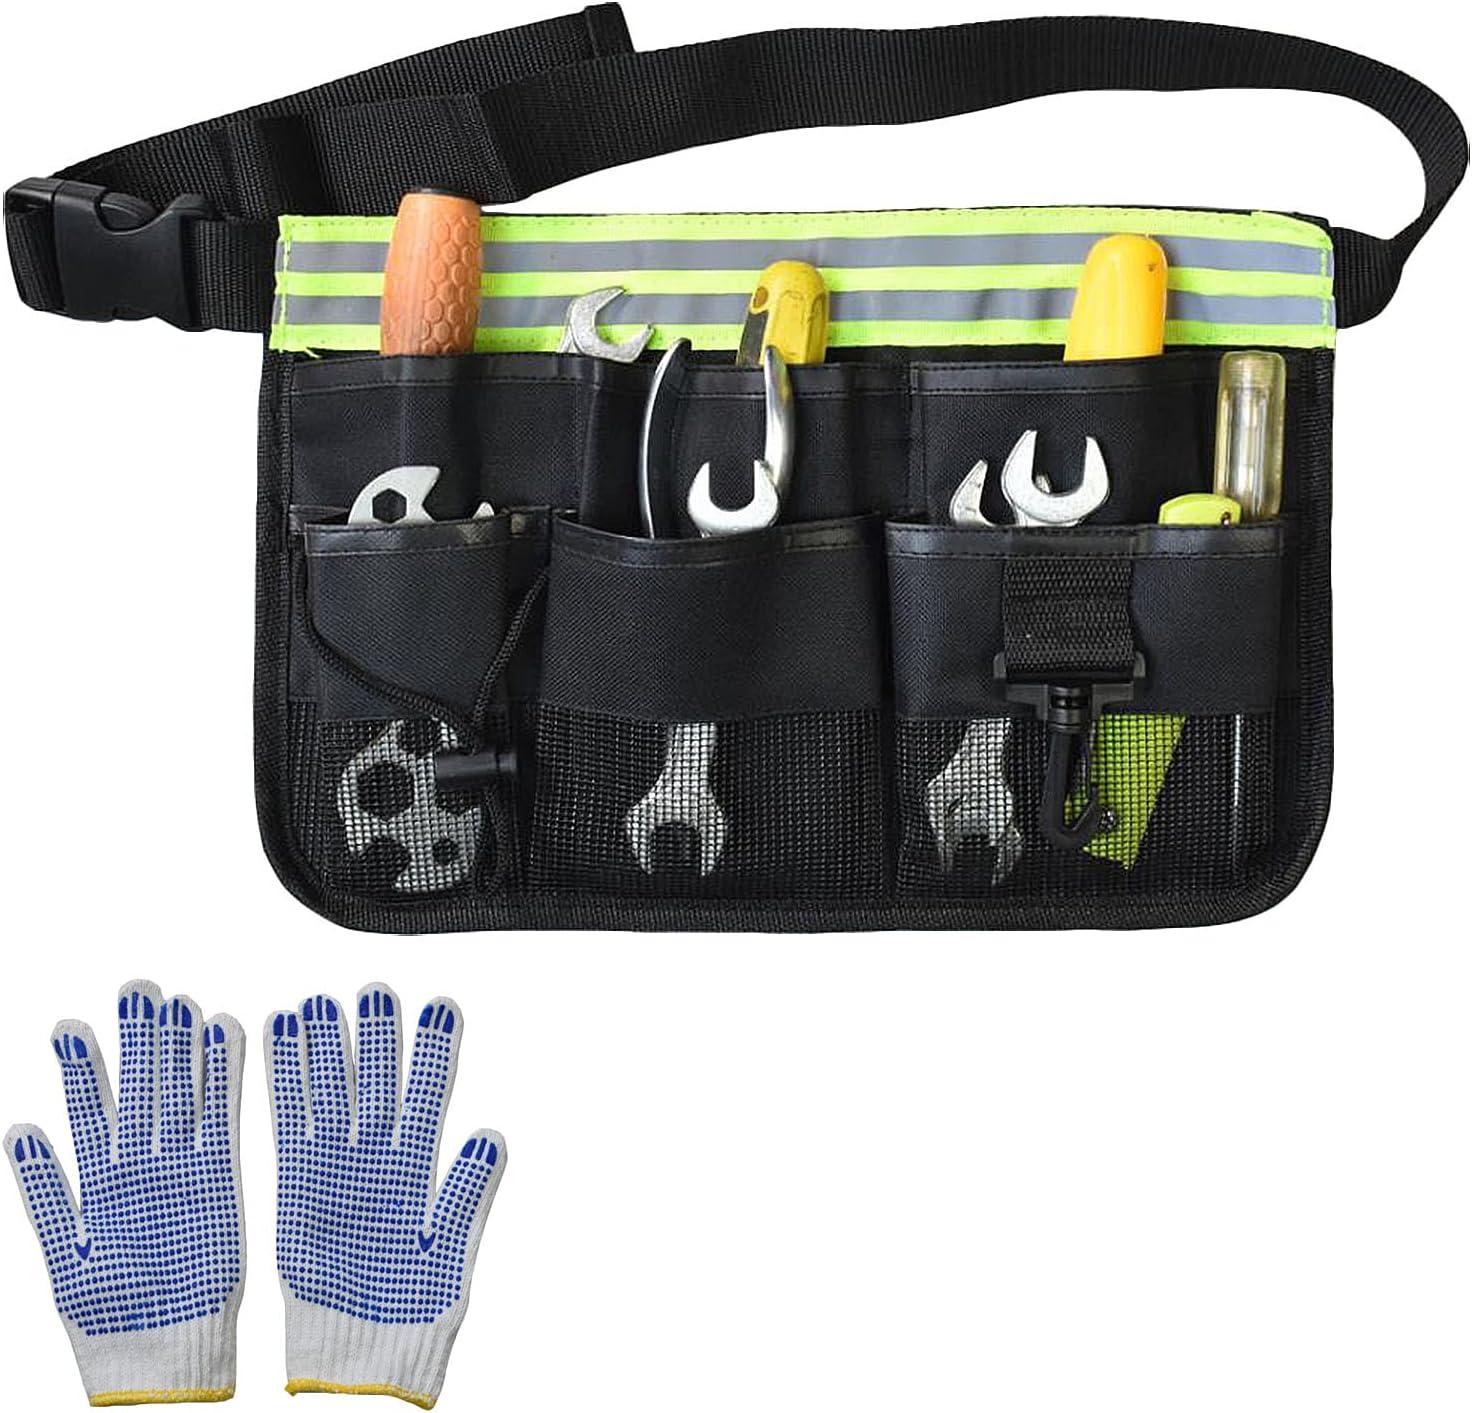 Gardening Tool Waist Bag Belt Gardening Tool Apron Organizer with 8 Pockets Hanging Pouch Tool Belt Attached Garden a Pair of Glove (Black)